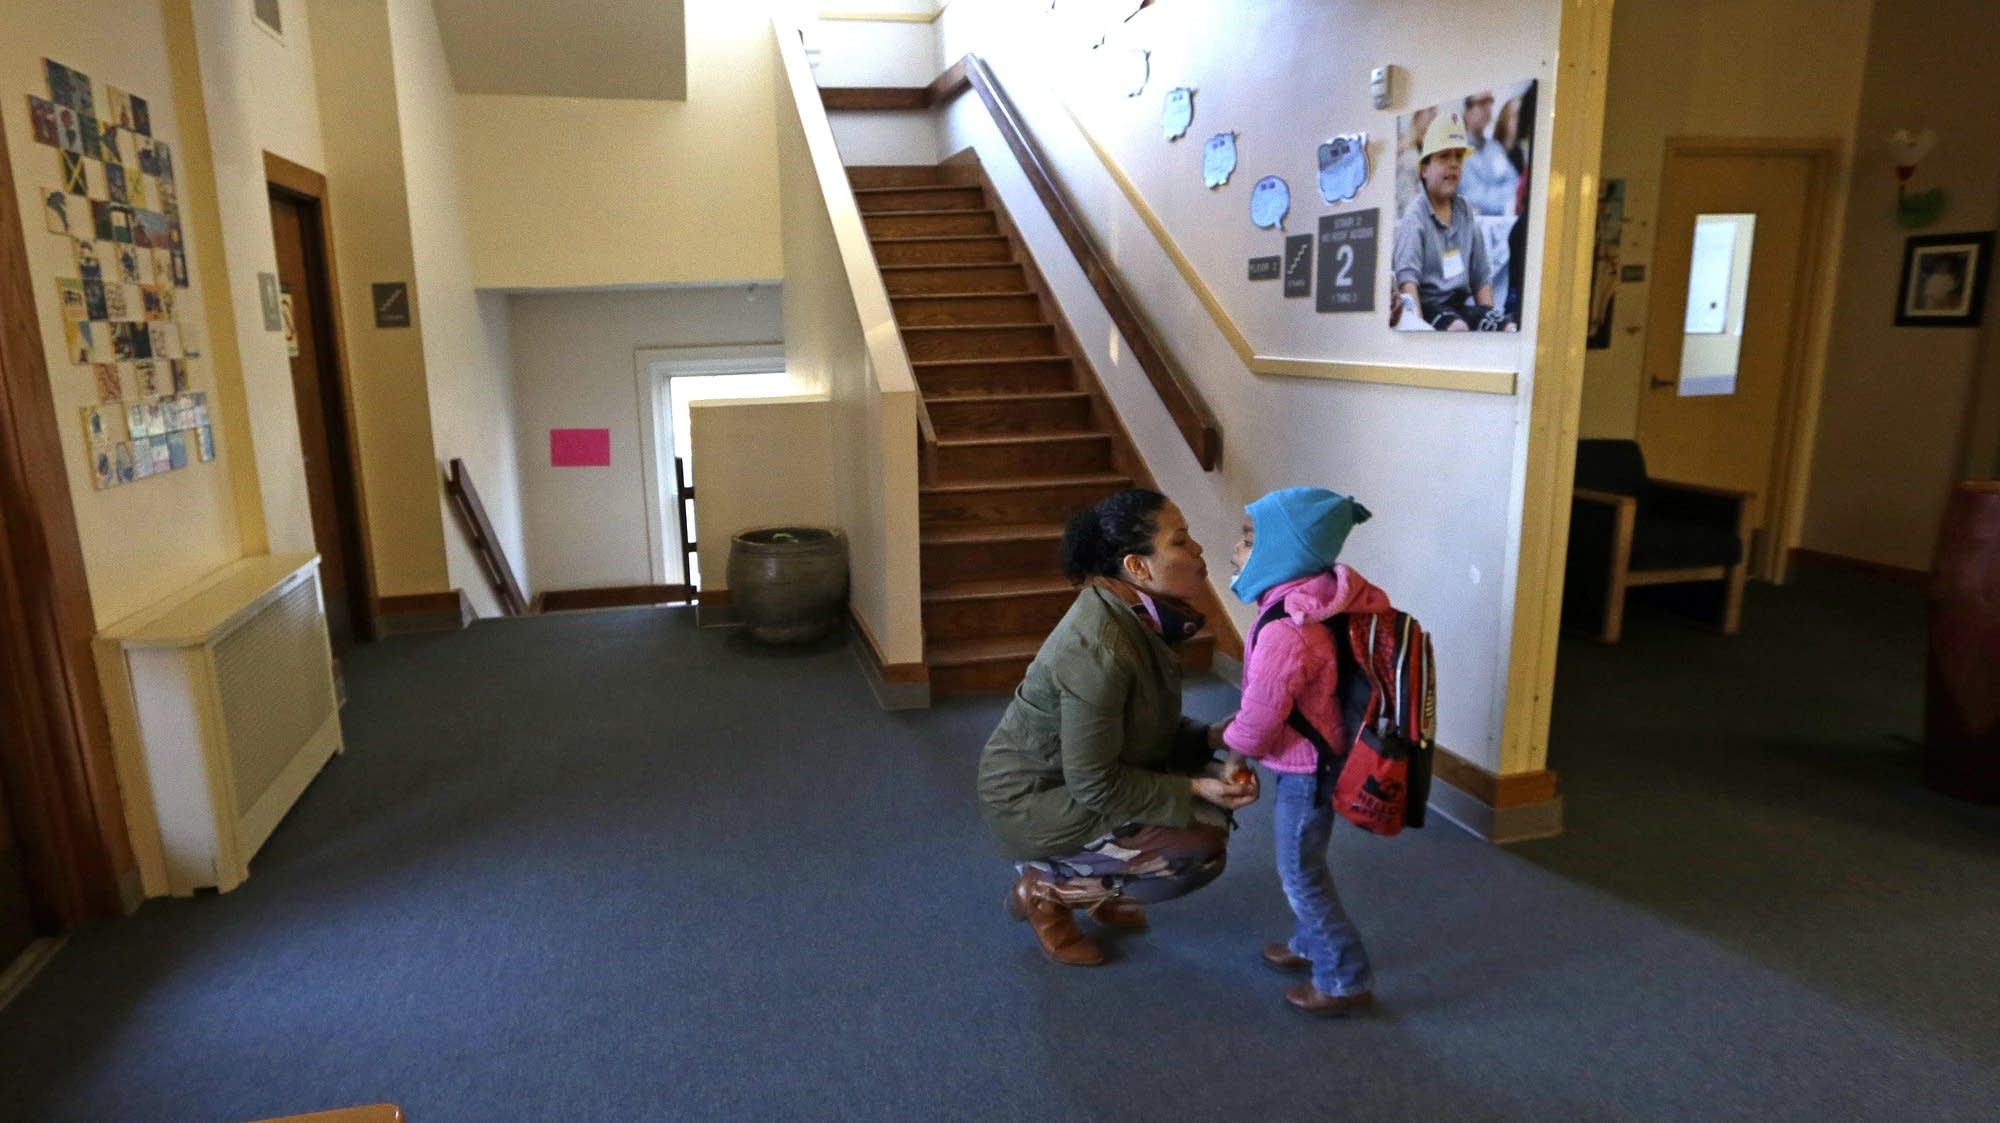 First Place Scholars school in Seattle